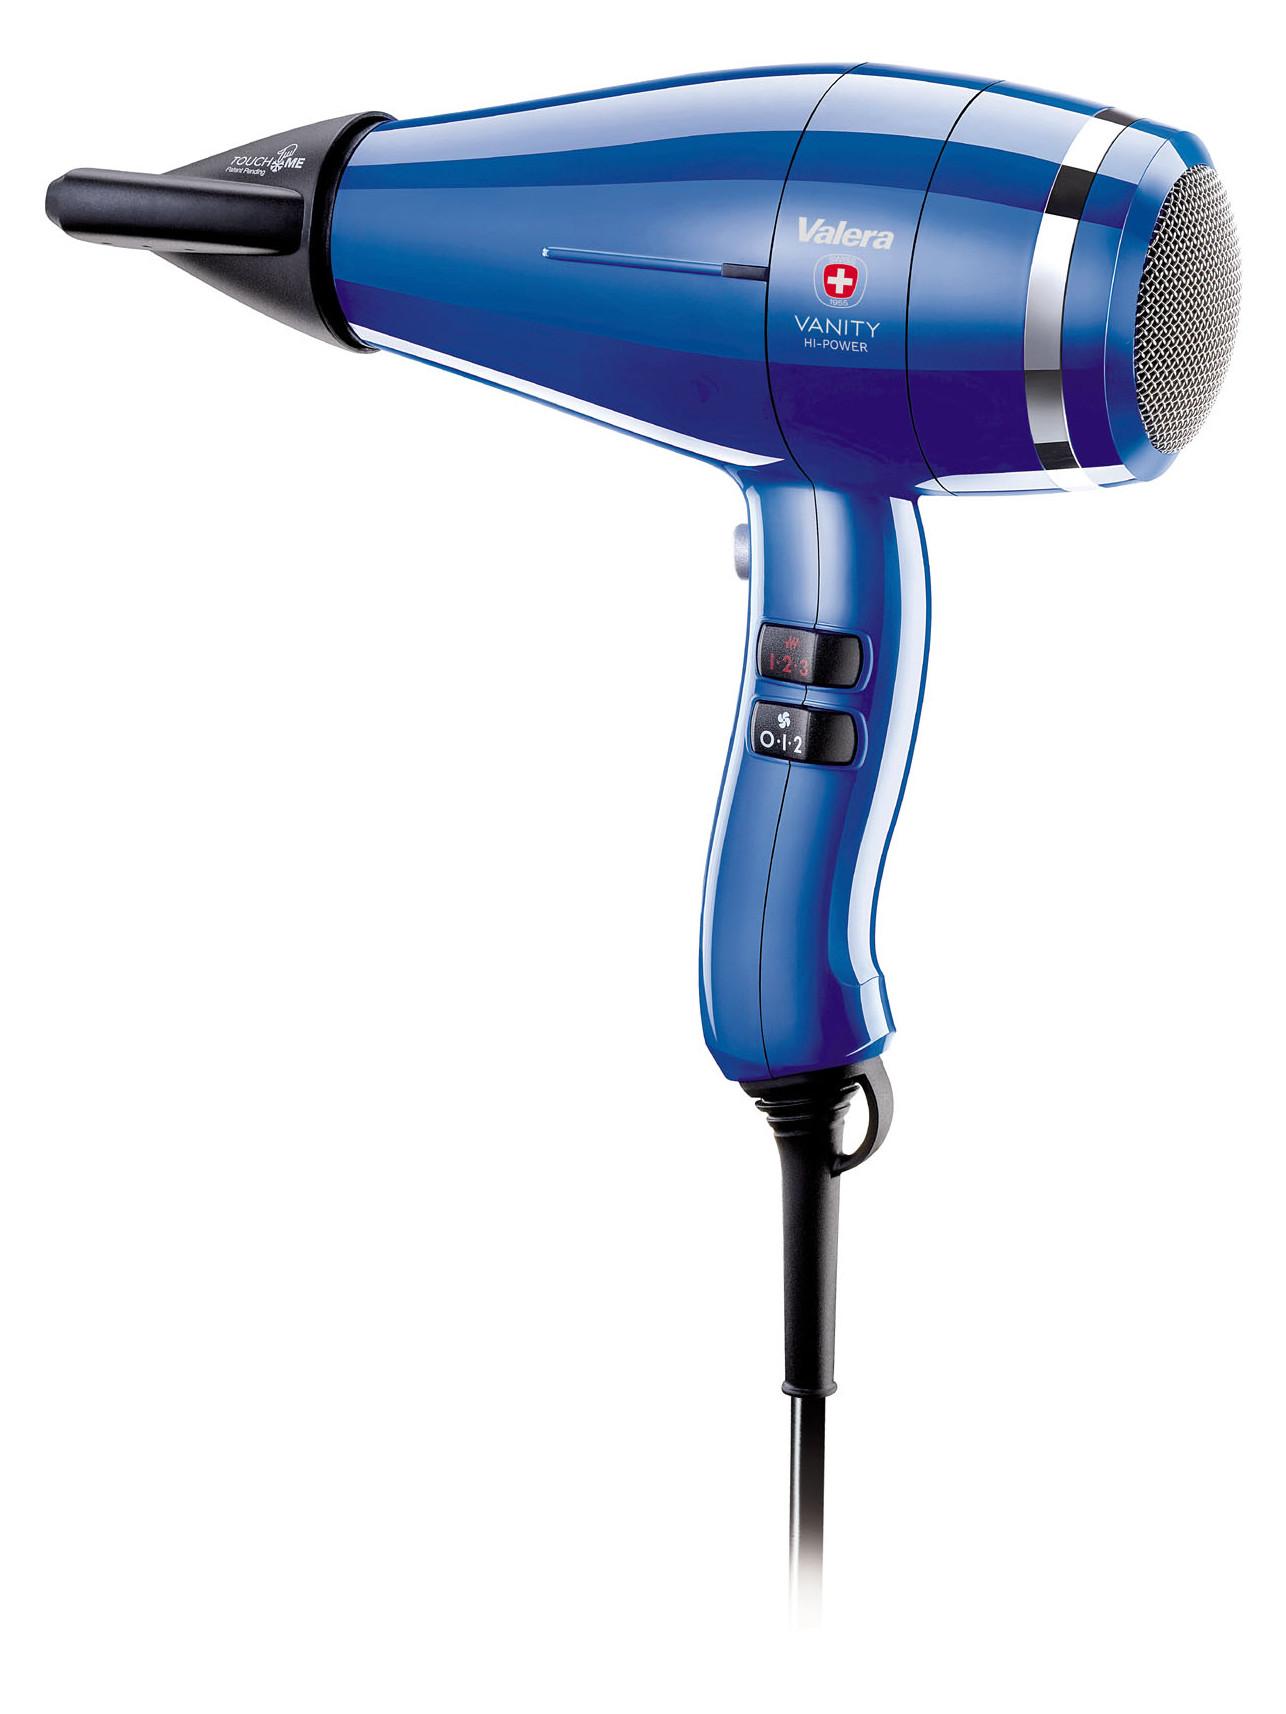 Profesionální fén Valera Vanity Hi-Power Royal Blue - 2400 W, modrý (VA8605RCRB) + DÁREK ZDARMA